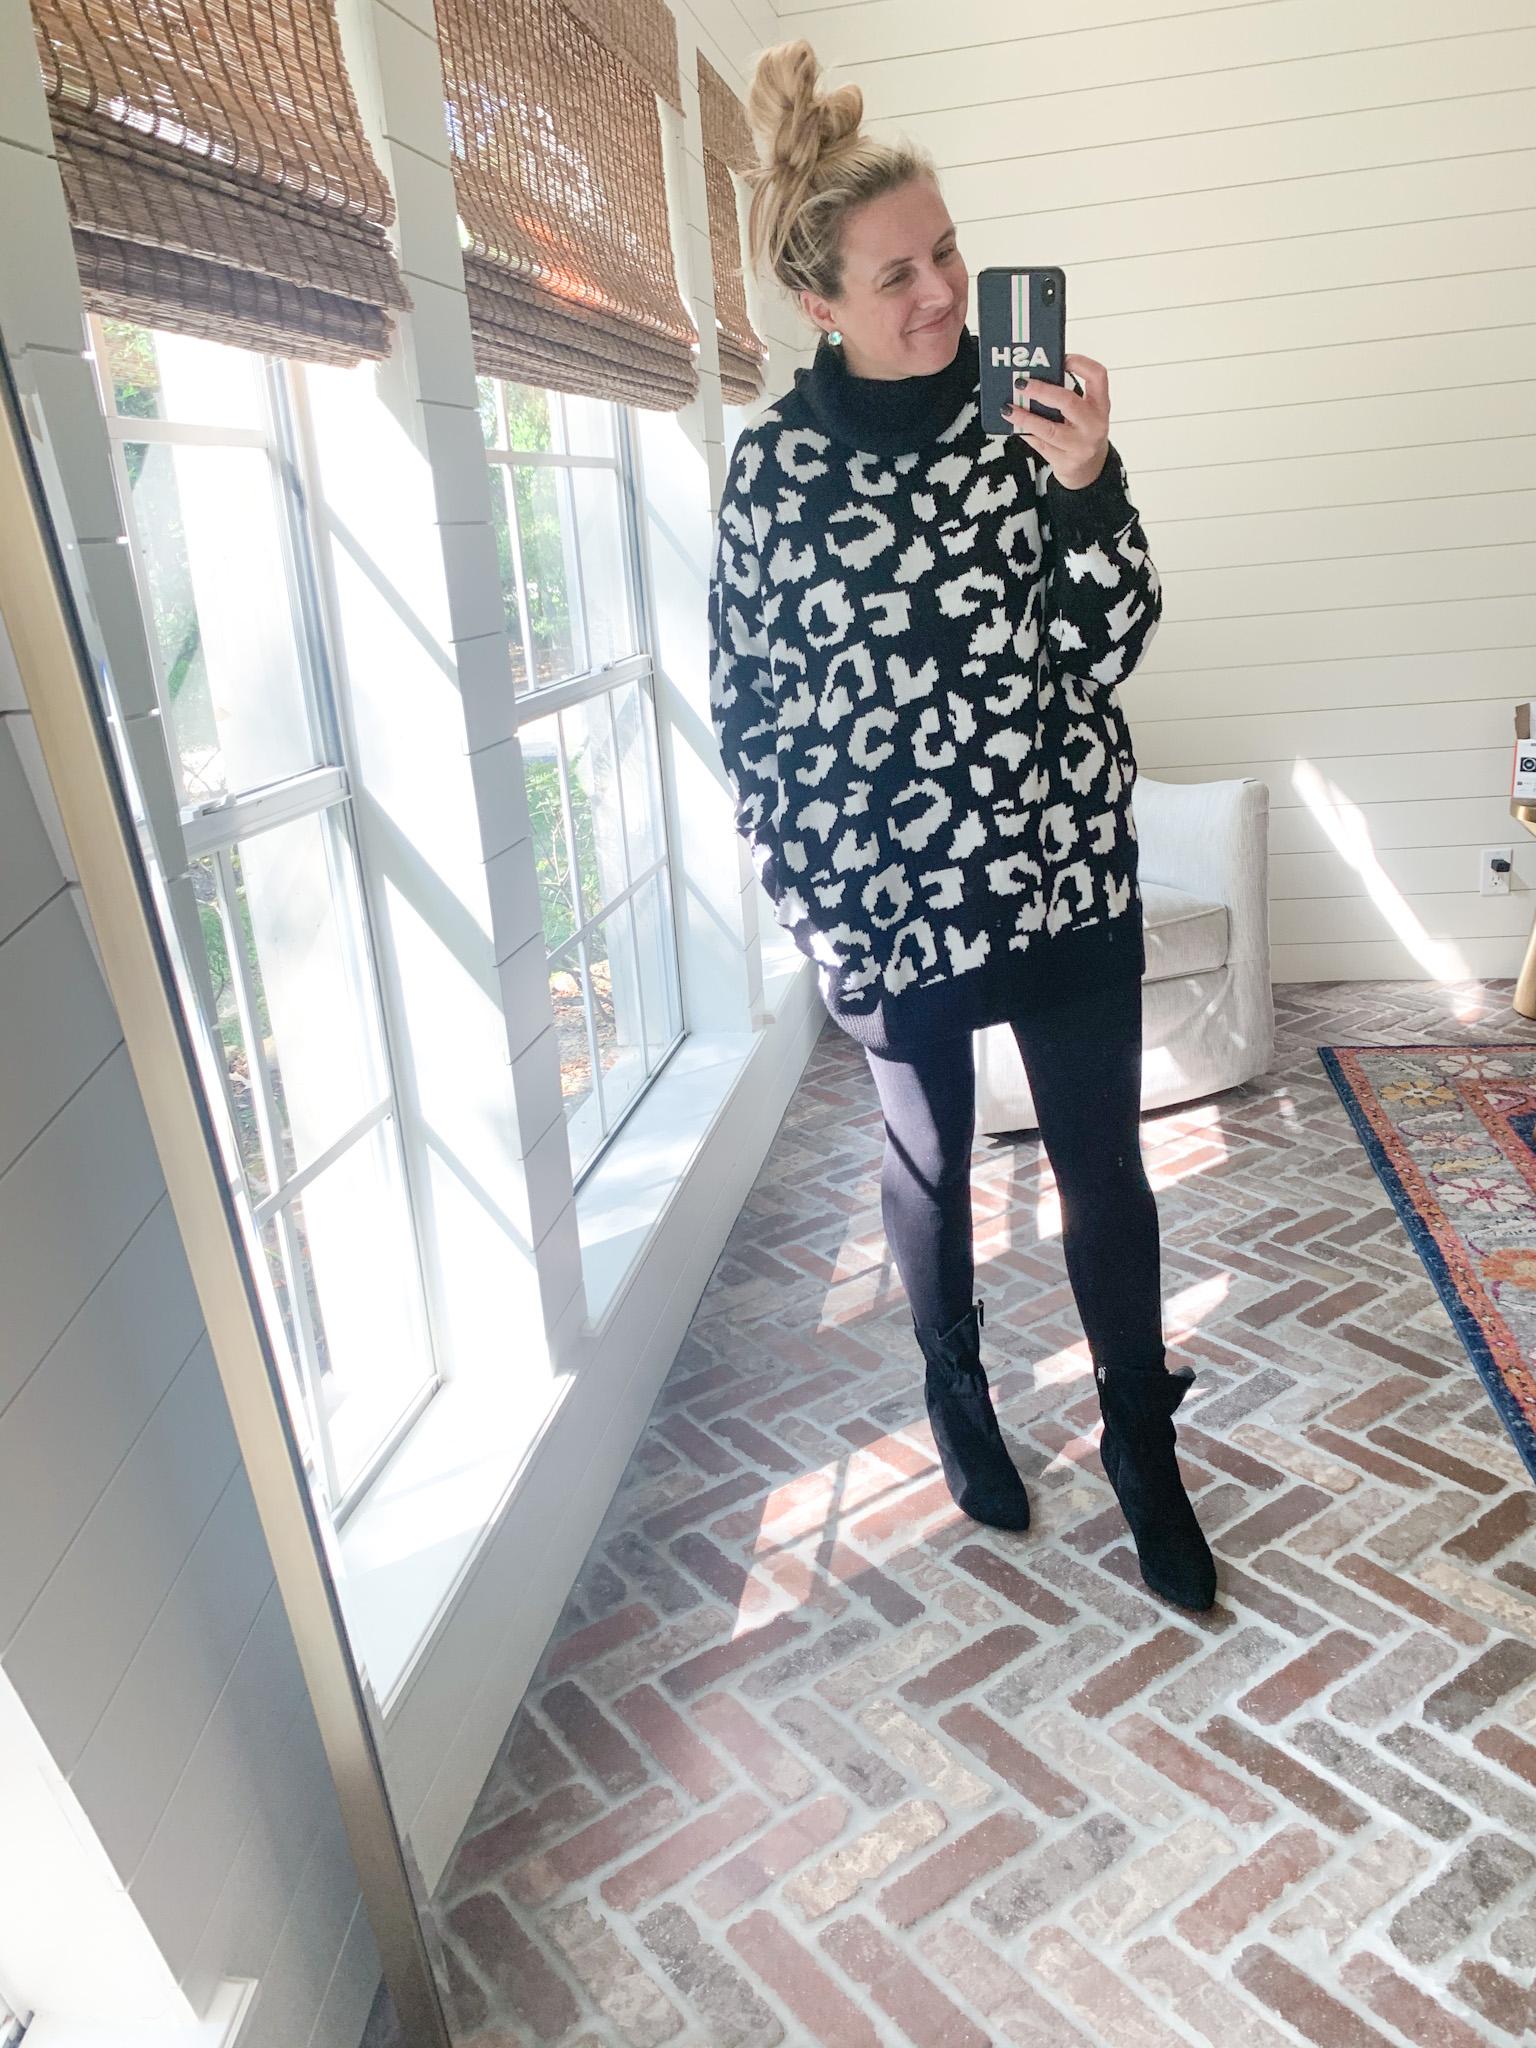 Amazon Haul by popular Houston fashion blog, Fancy Ashley: image of a woman wearing a Amazon Pink Queen Women's Loose Oversize Turtleneck Wool Long Pullover Sweater Dress, black leggings, and Walmart Scoop Women's Blair Scrunch Stiletto Heeled Booties